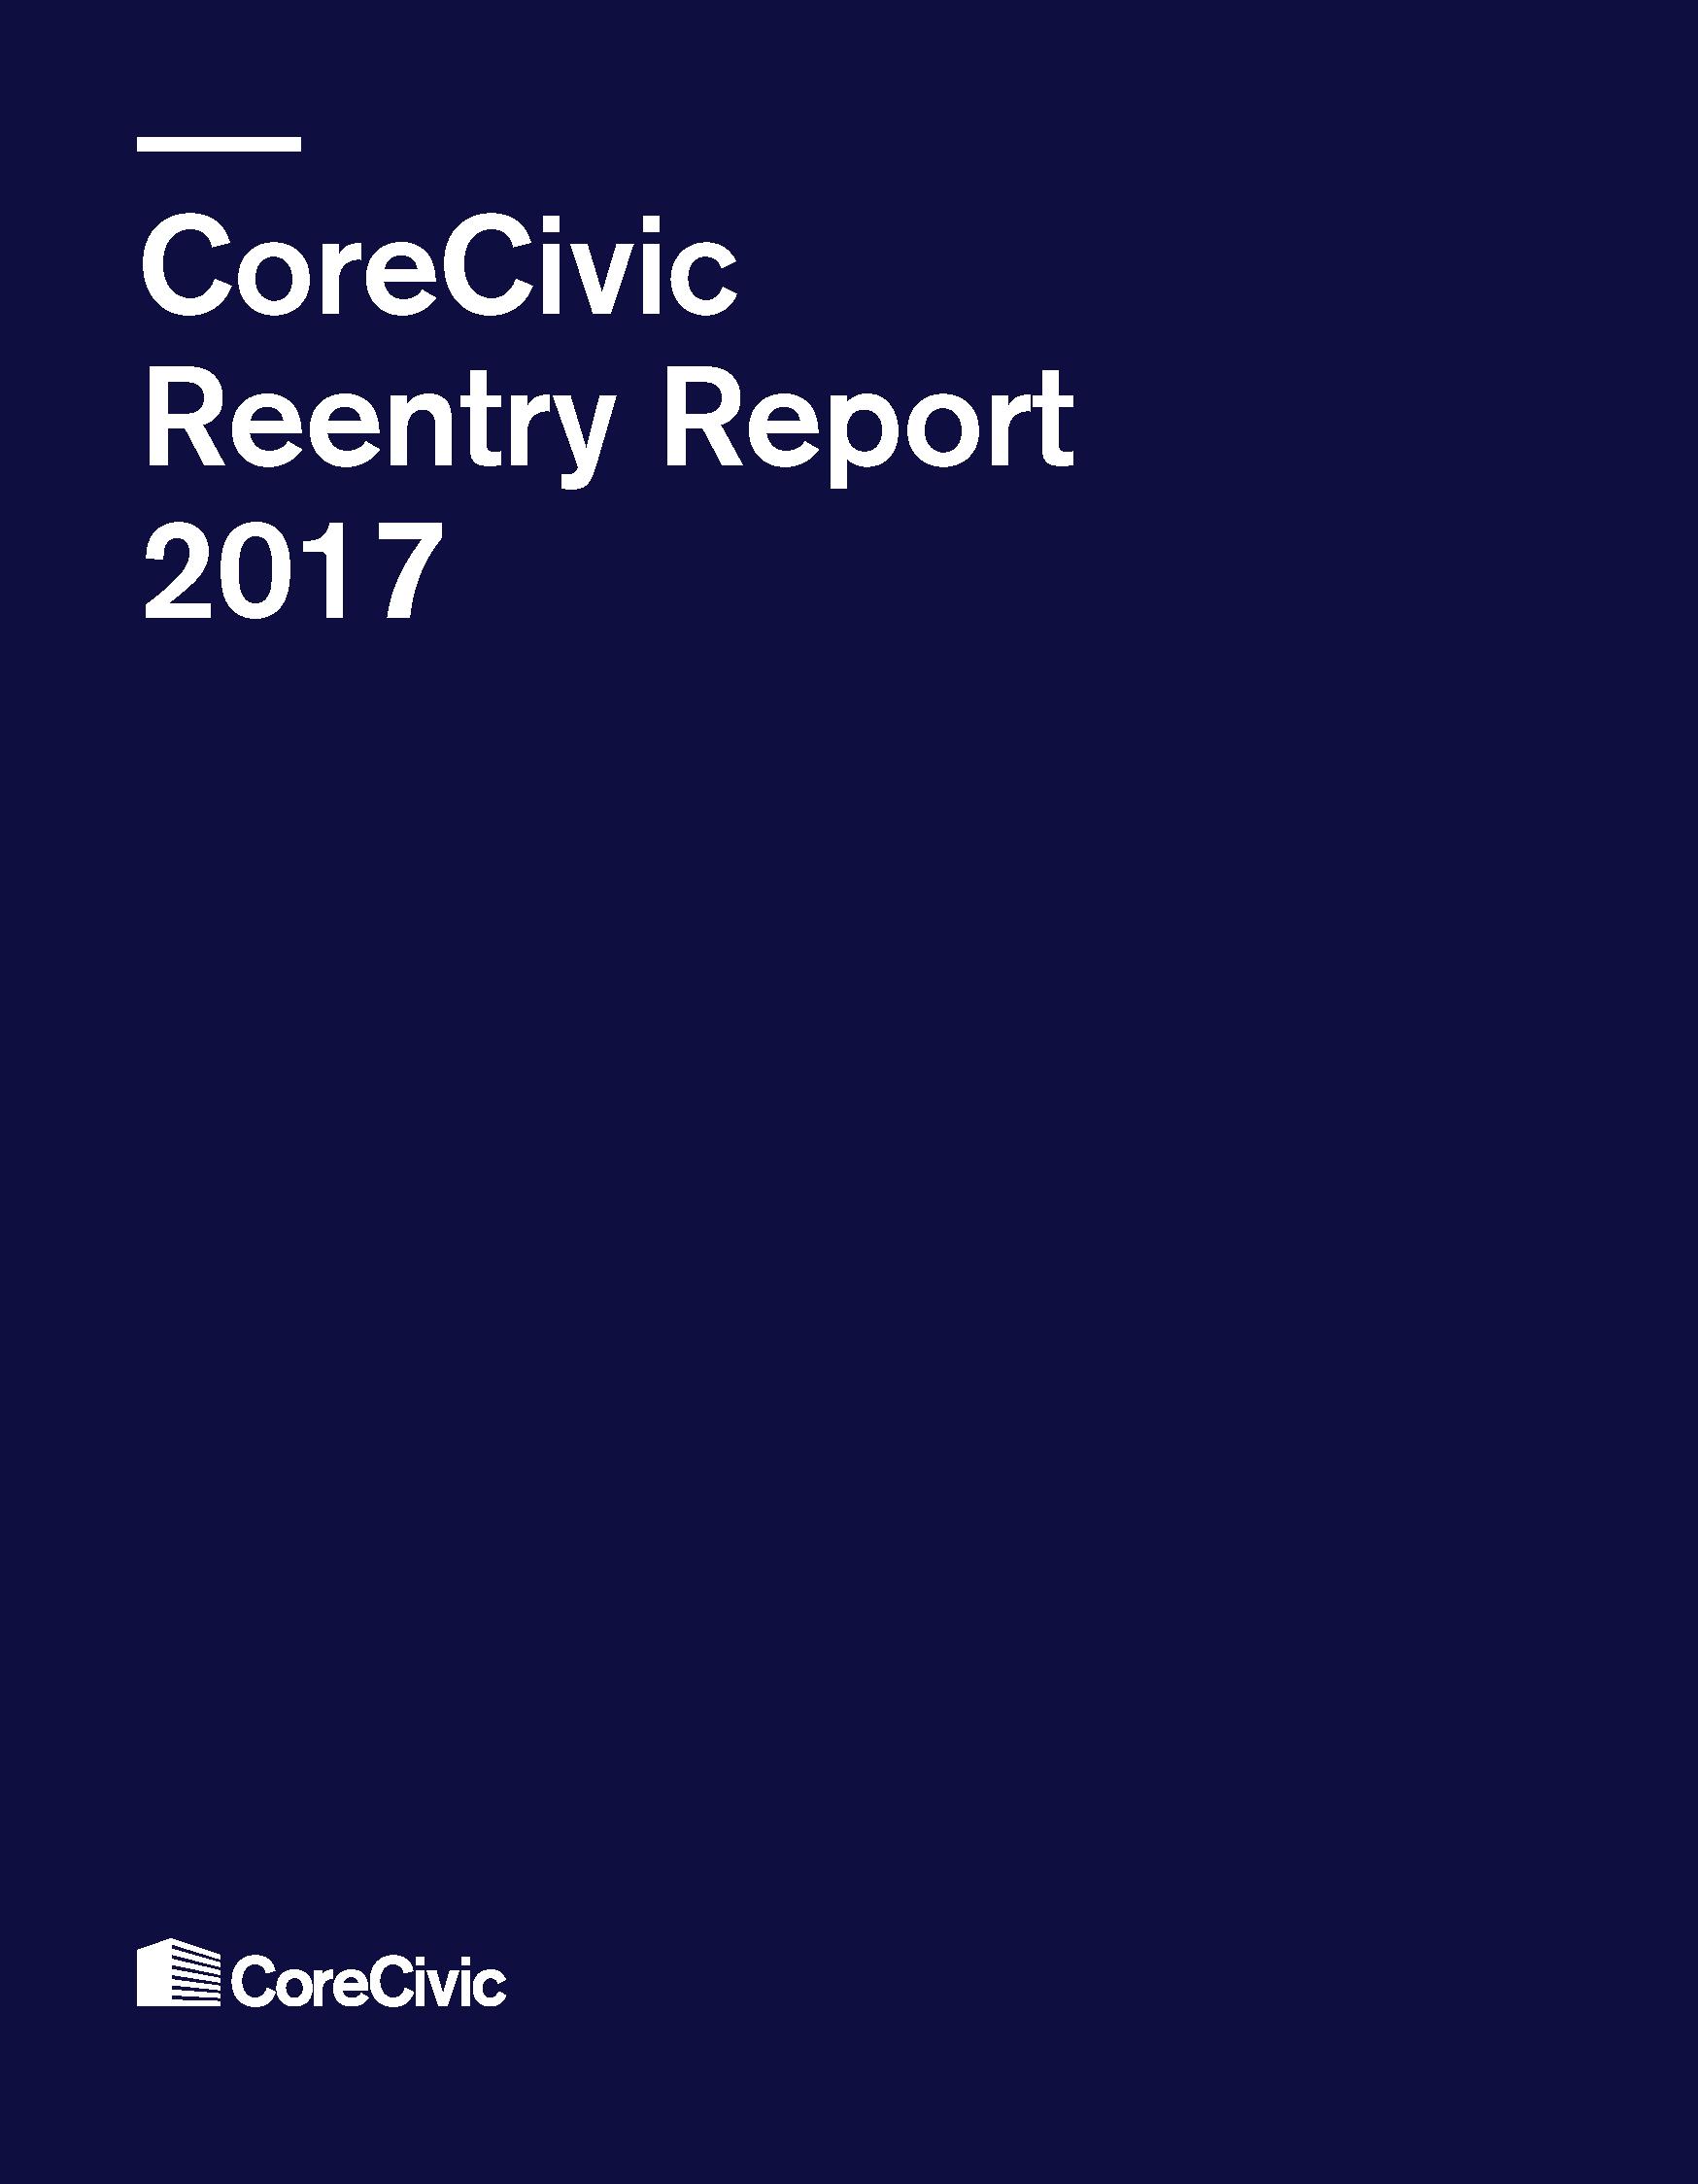 CoreCivic_ReentryReport_COVER_3.8.18